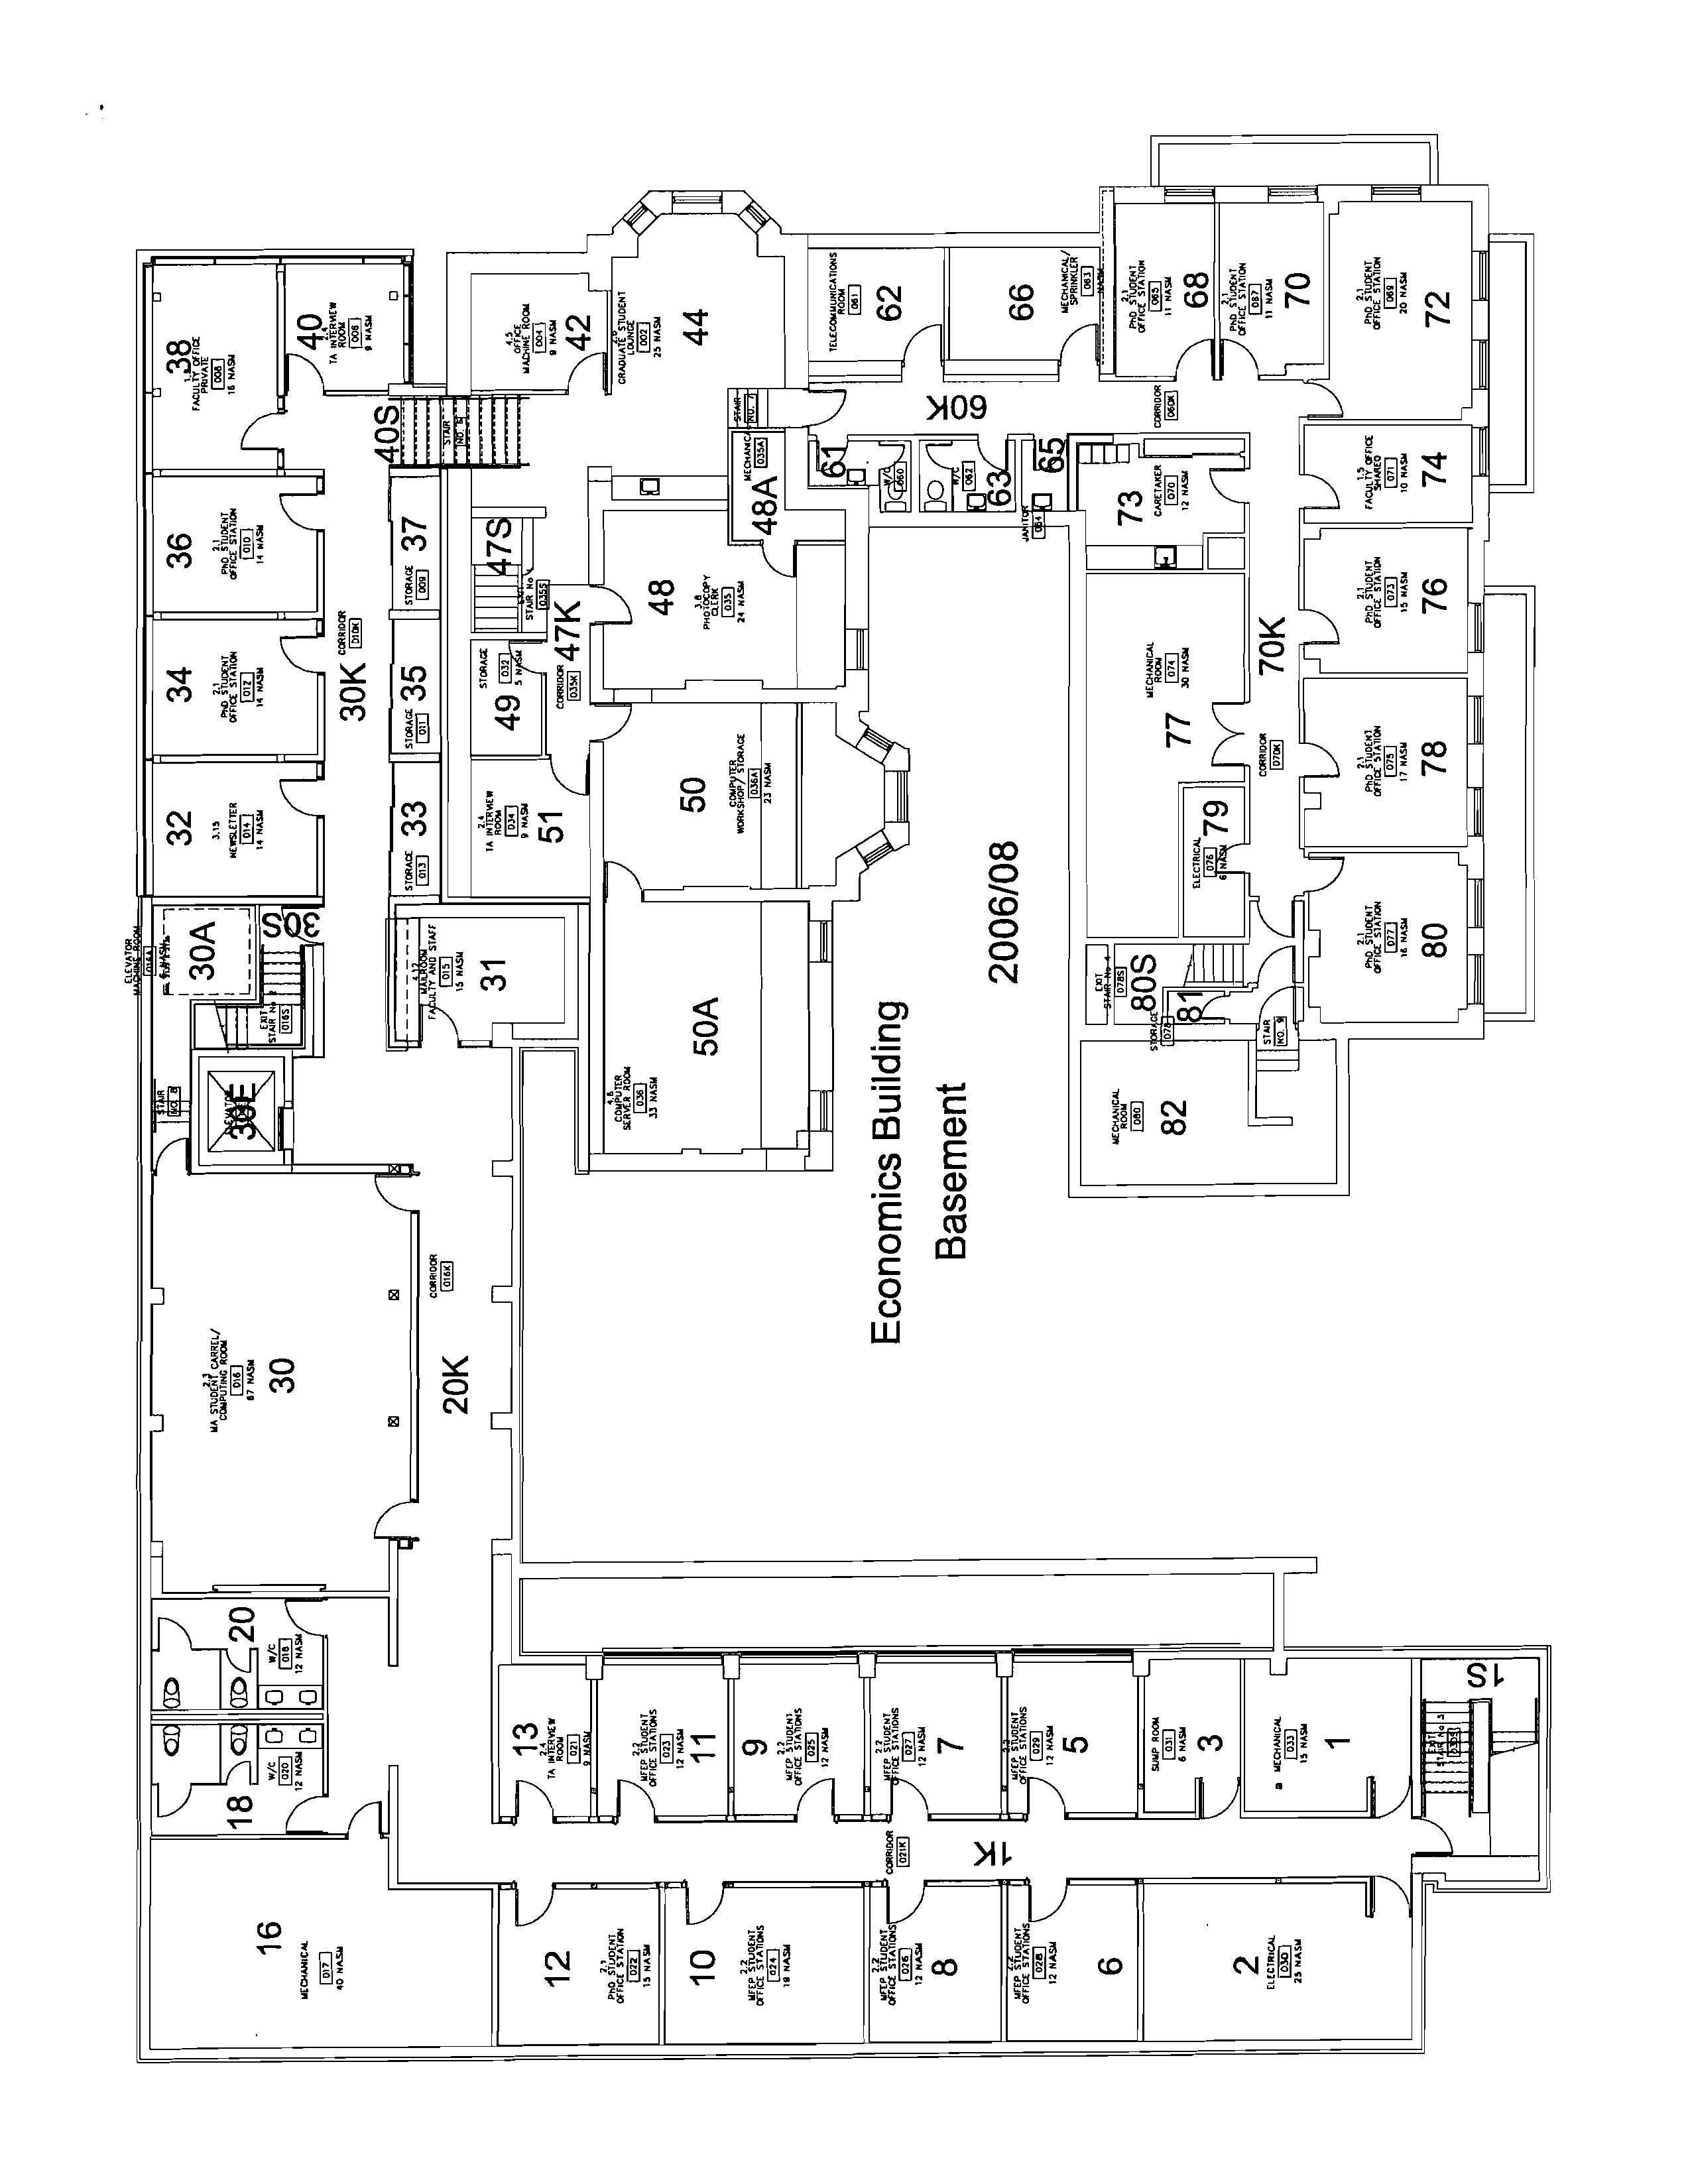 U of t economics overview of the economics building for U build it floor plans